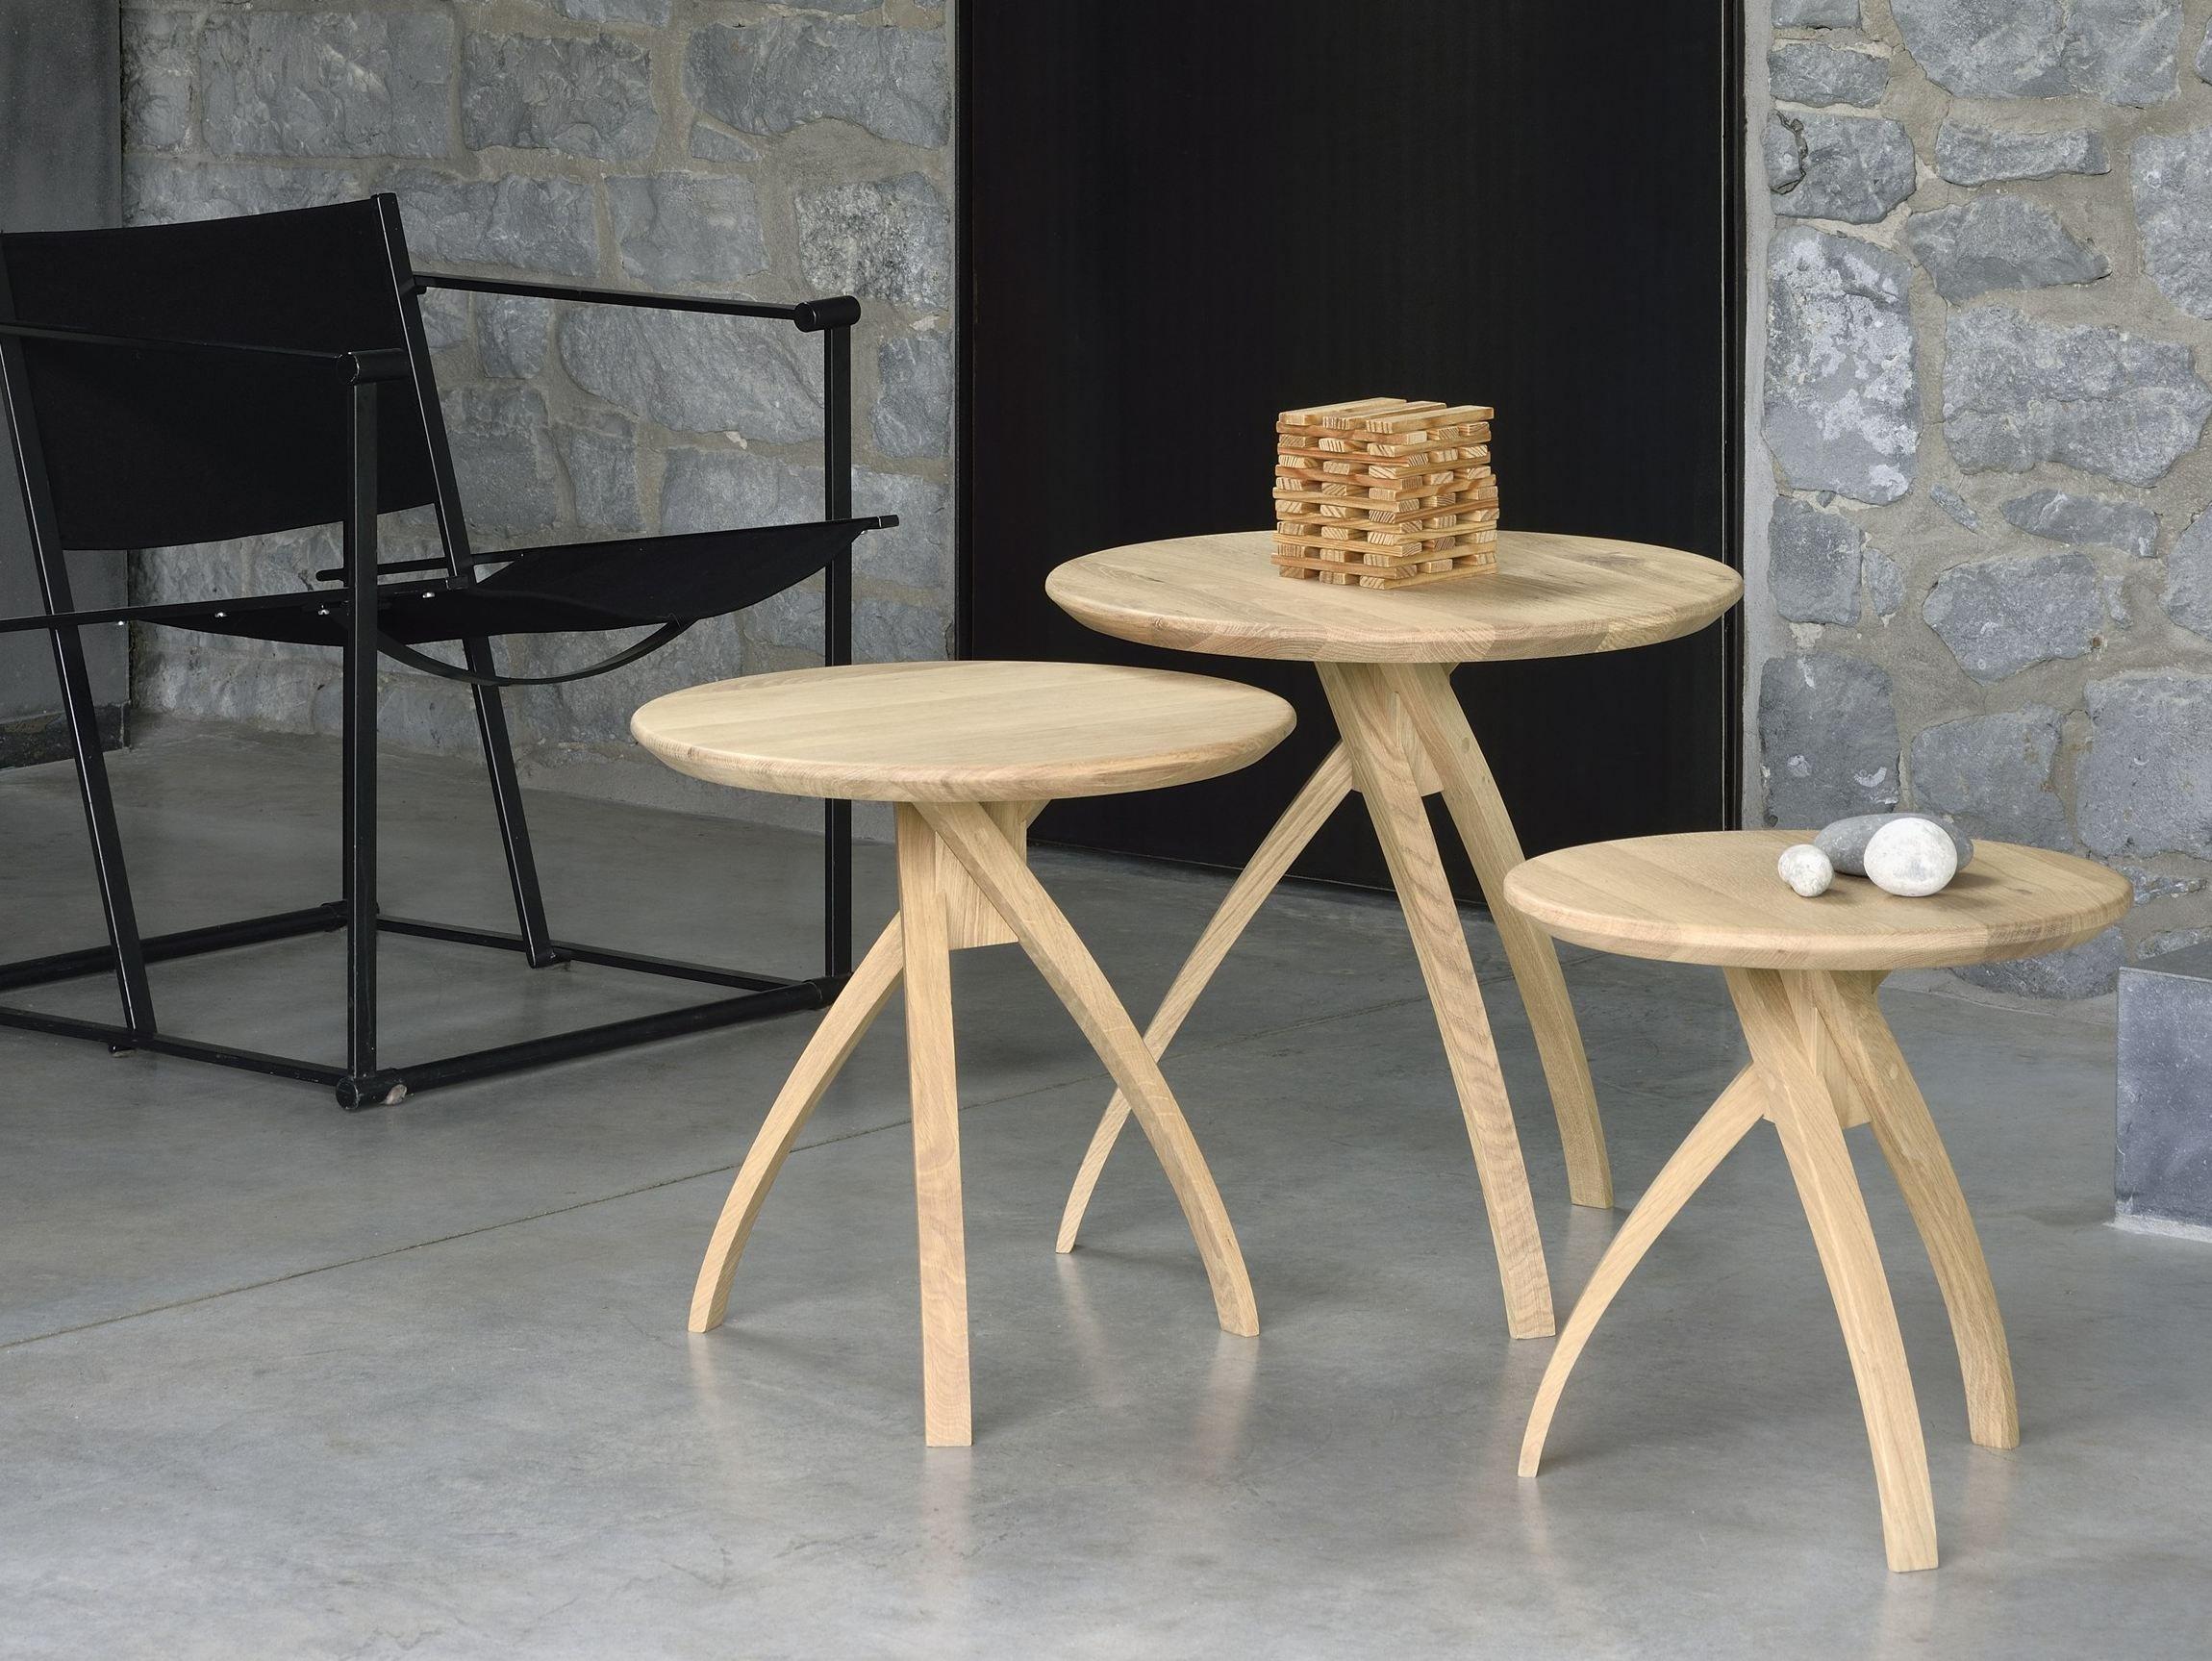 oak tripod table | coffee table by ethnicraft